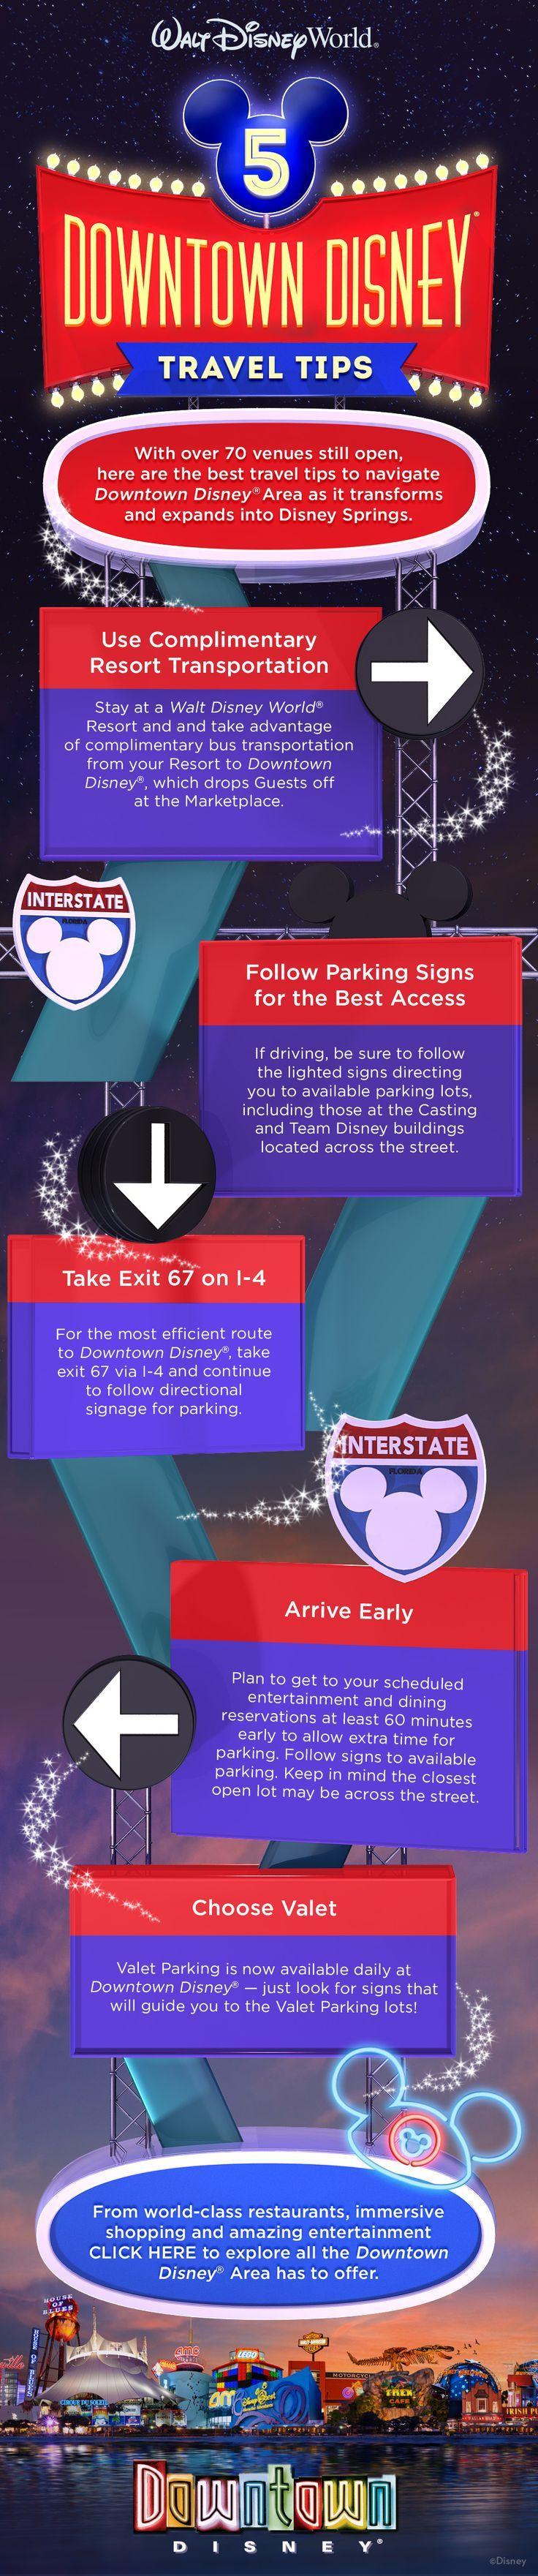 Downtown Disney Travel Tips from Walt Disney World! | Downtown Disney | Disney Springs |  Disney Tips and Tricks | Disney Tips | Disney World Tips | Disney World Tips & Tricks | Disney World Planning | Disney World Planning Tips | Disney Travel Ideas | Disney Travel Tips |